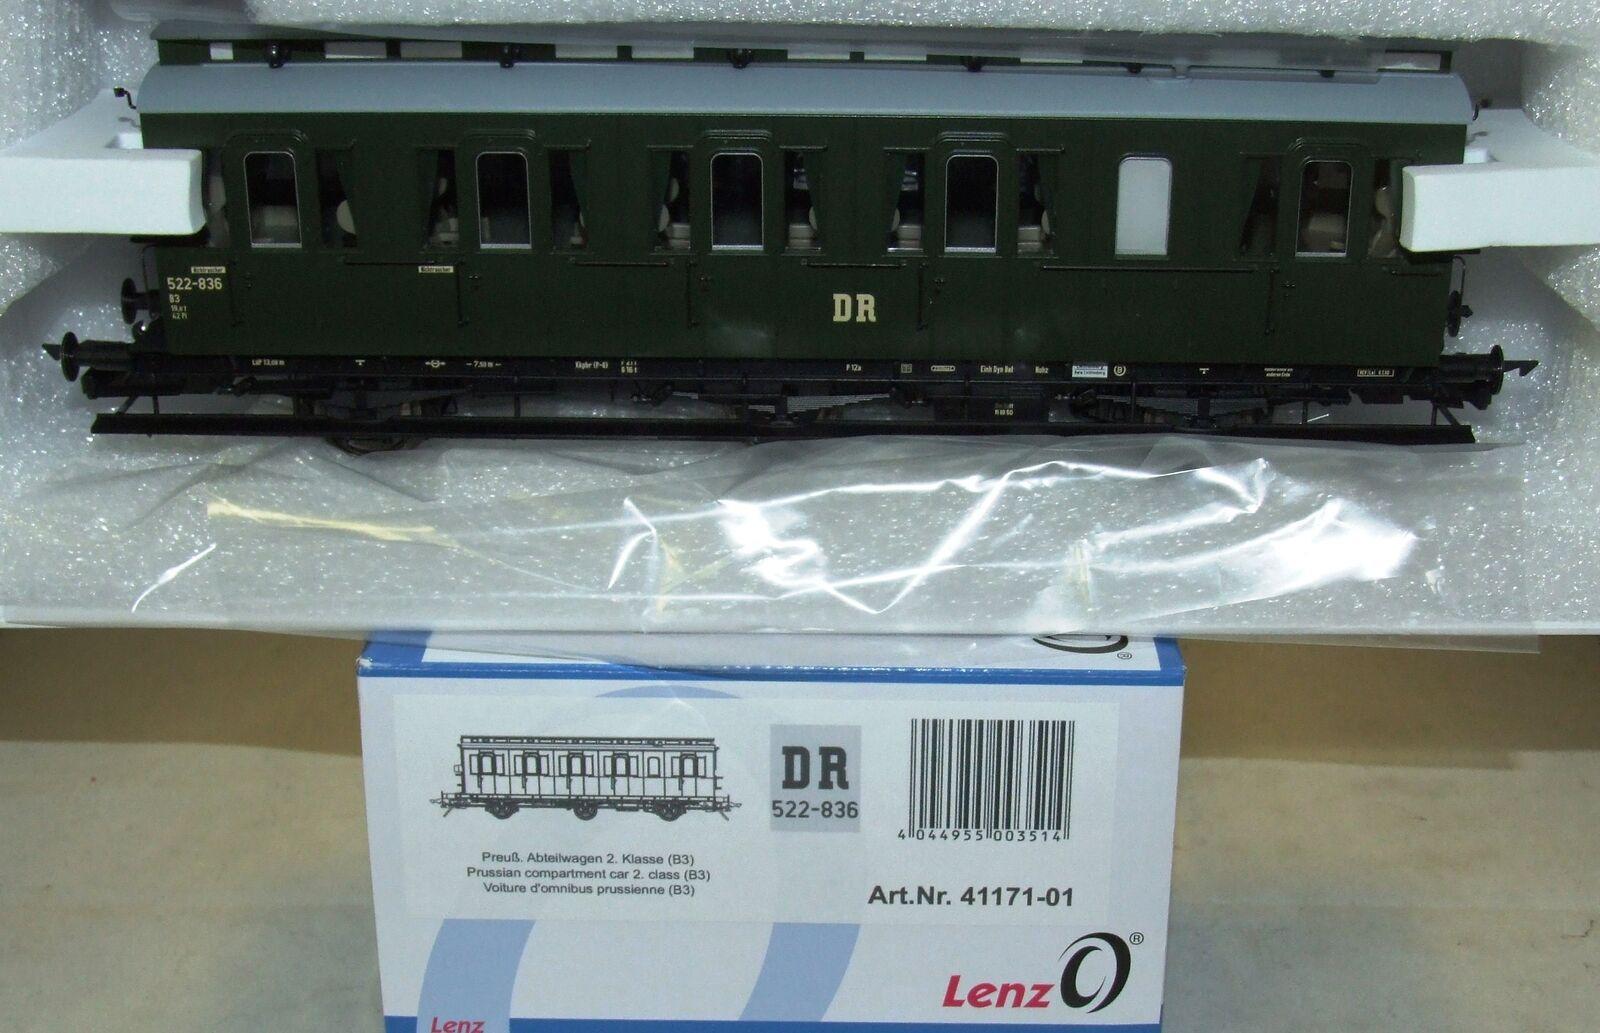 servicio considerado Lenz 41171-01 Escala 0 Prusiano Vagón de Compartimentos Modelo B3 B3 B3 o Bremserh Dr  Sin impuestos